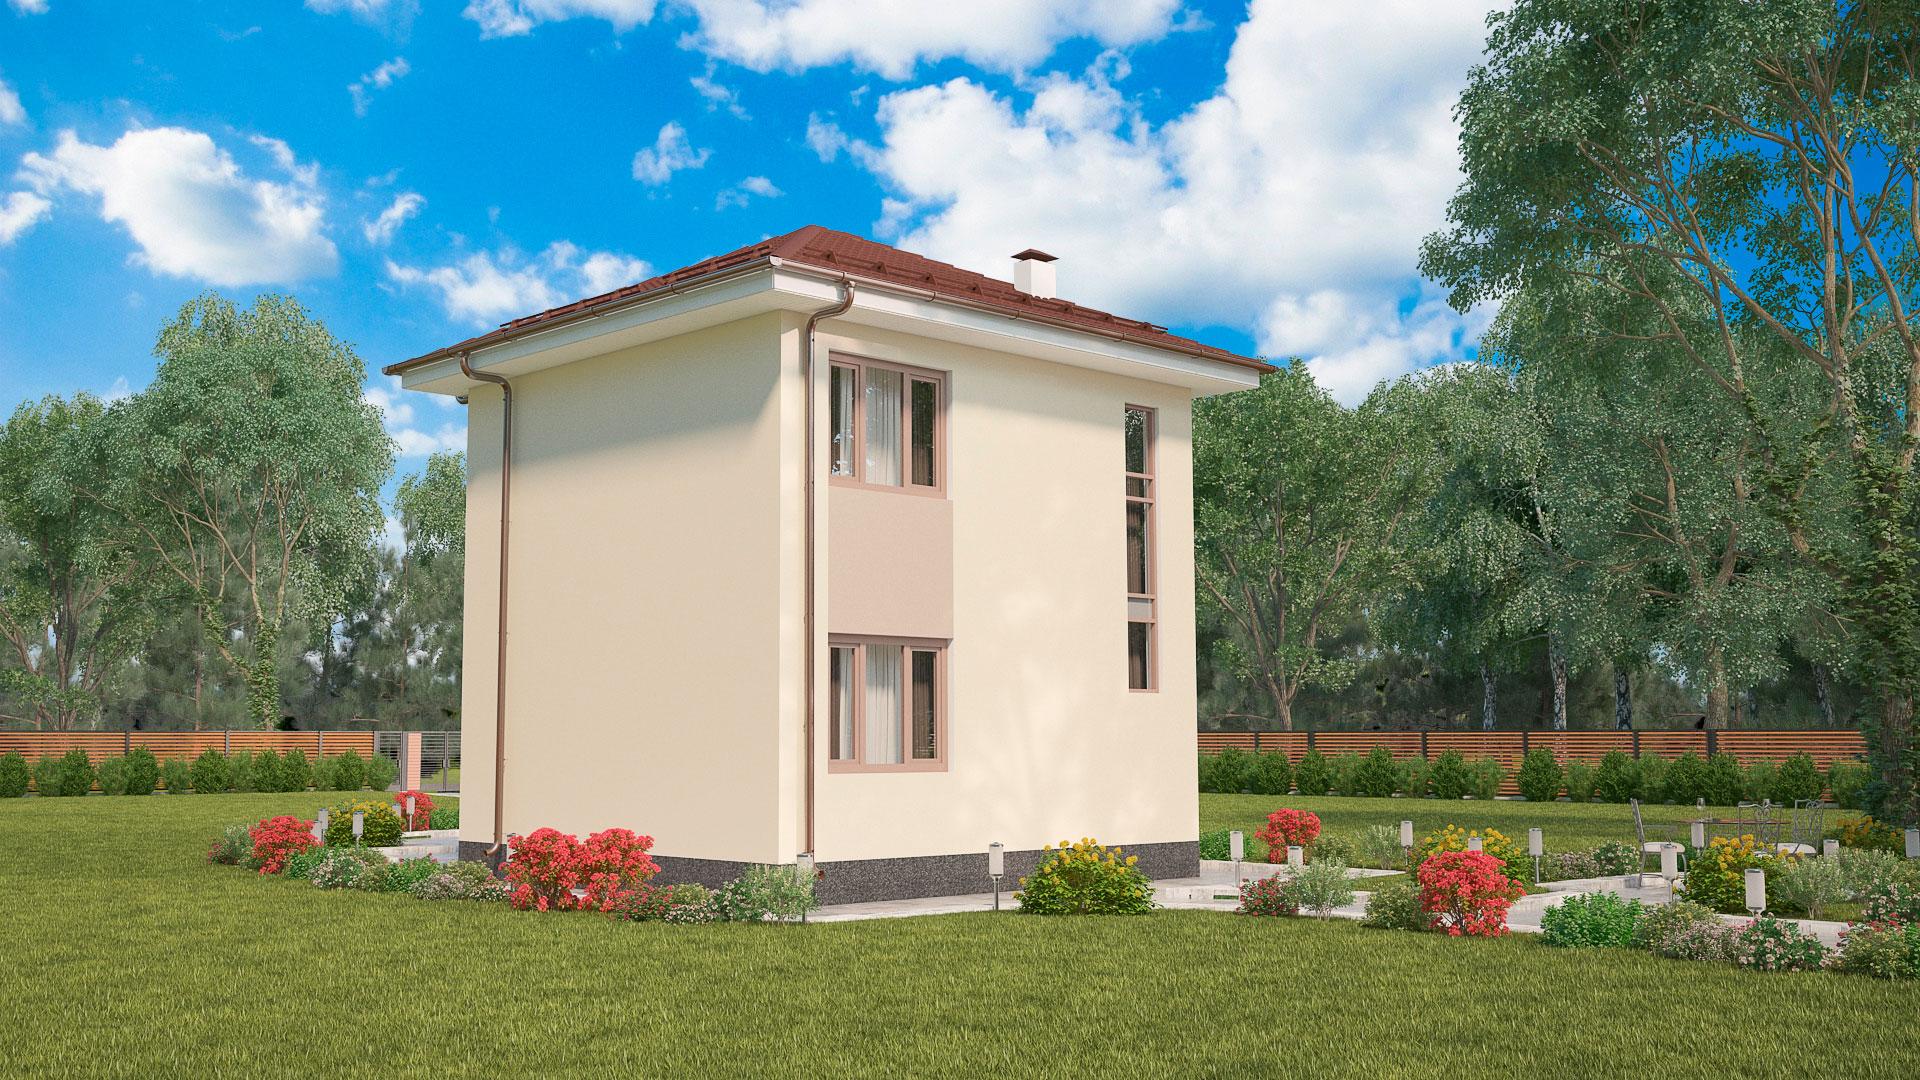 Задний фасад двухэтажного дома БЭНПАН, проект МС-69.